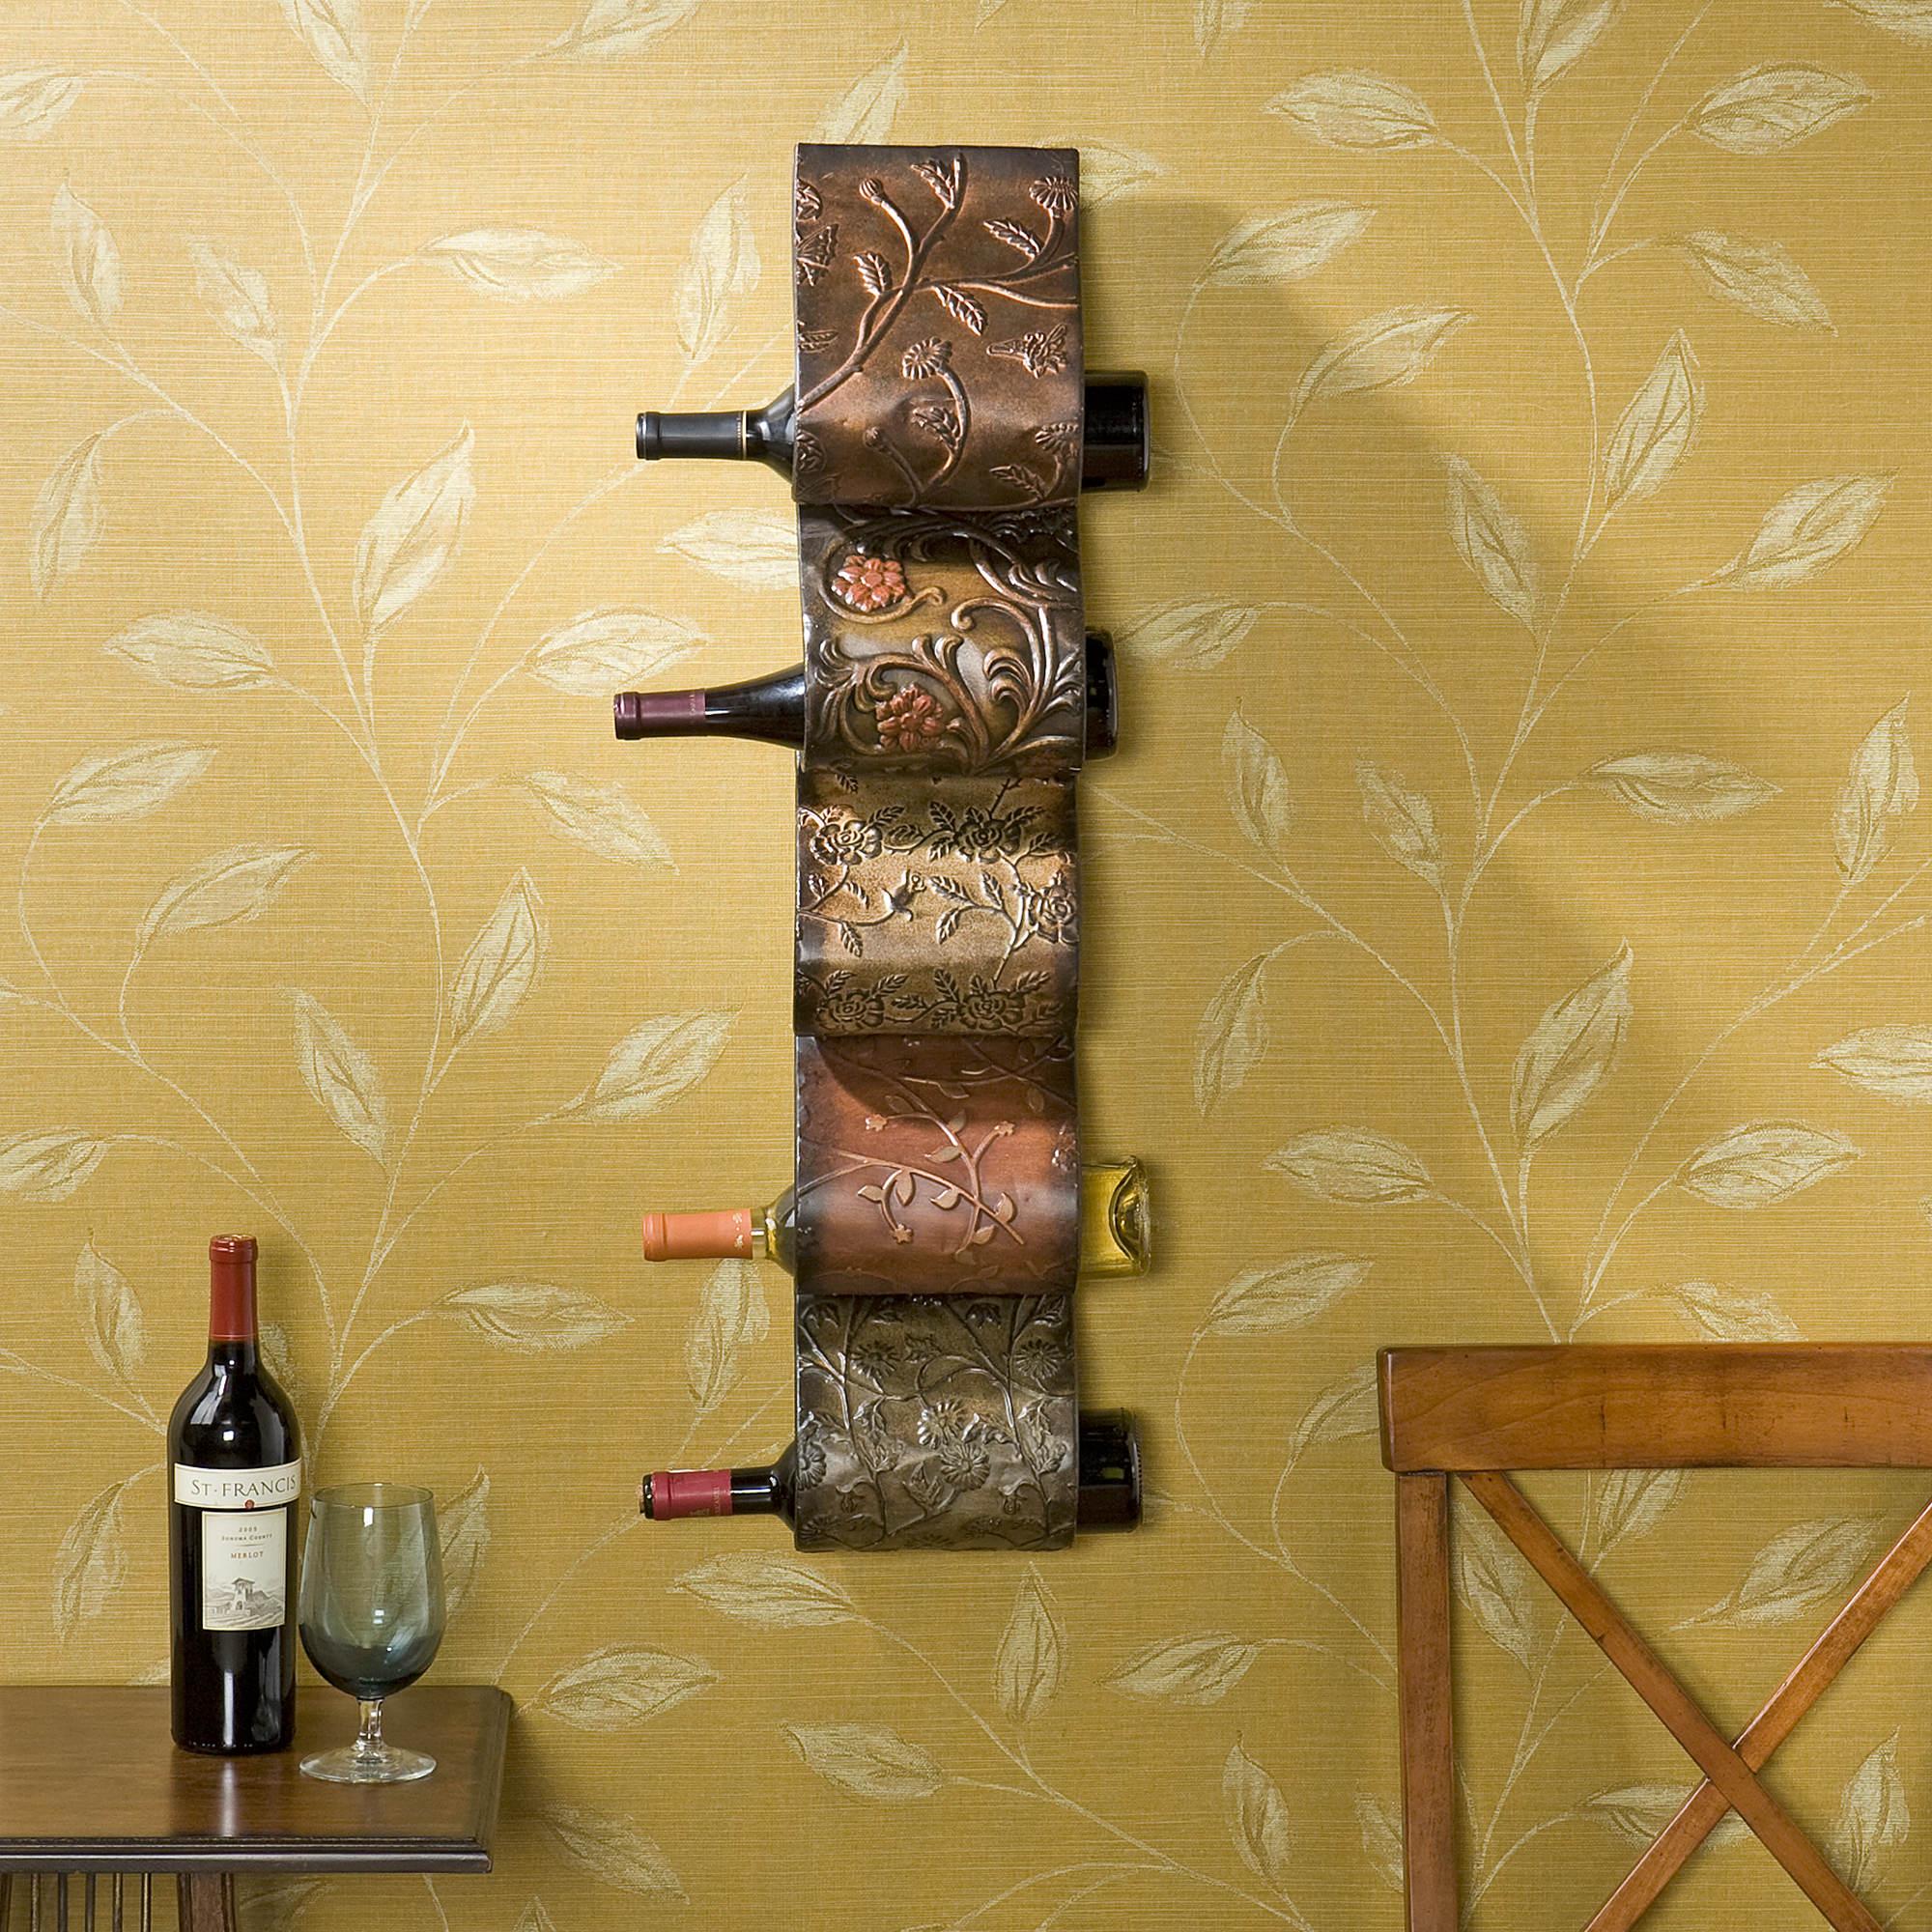 Contemporary Wine Bar Wall Decor Ideas - All About Wallart ...